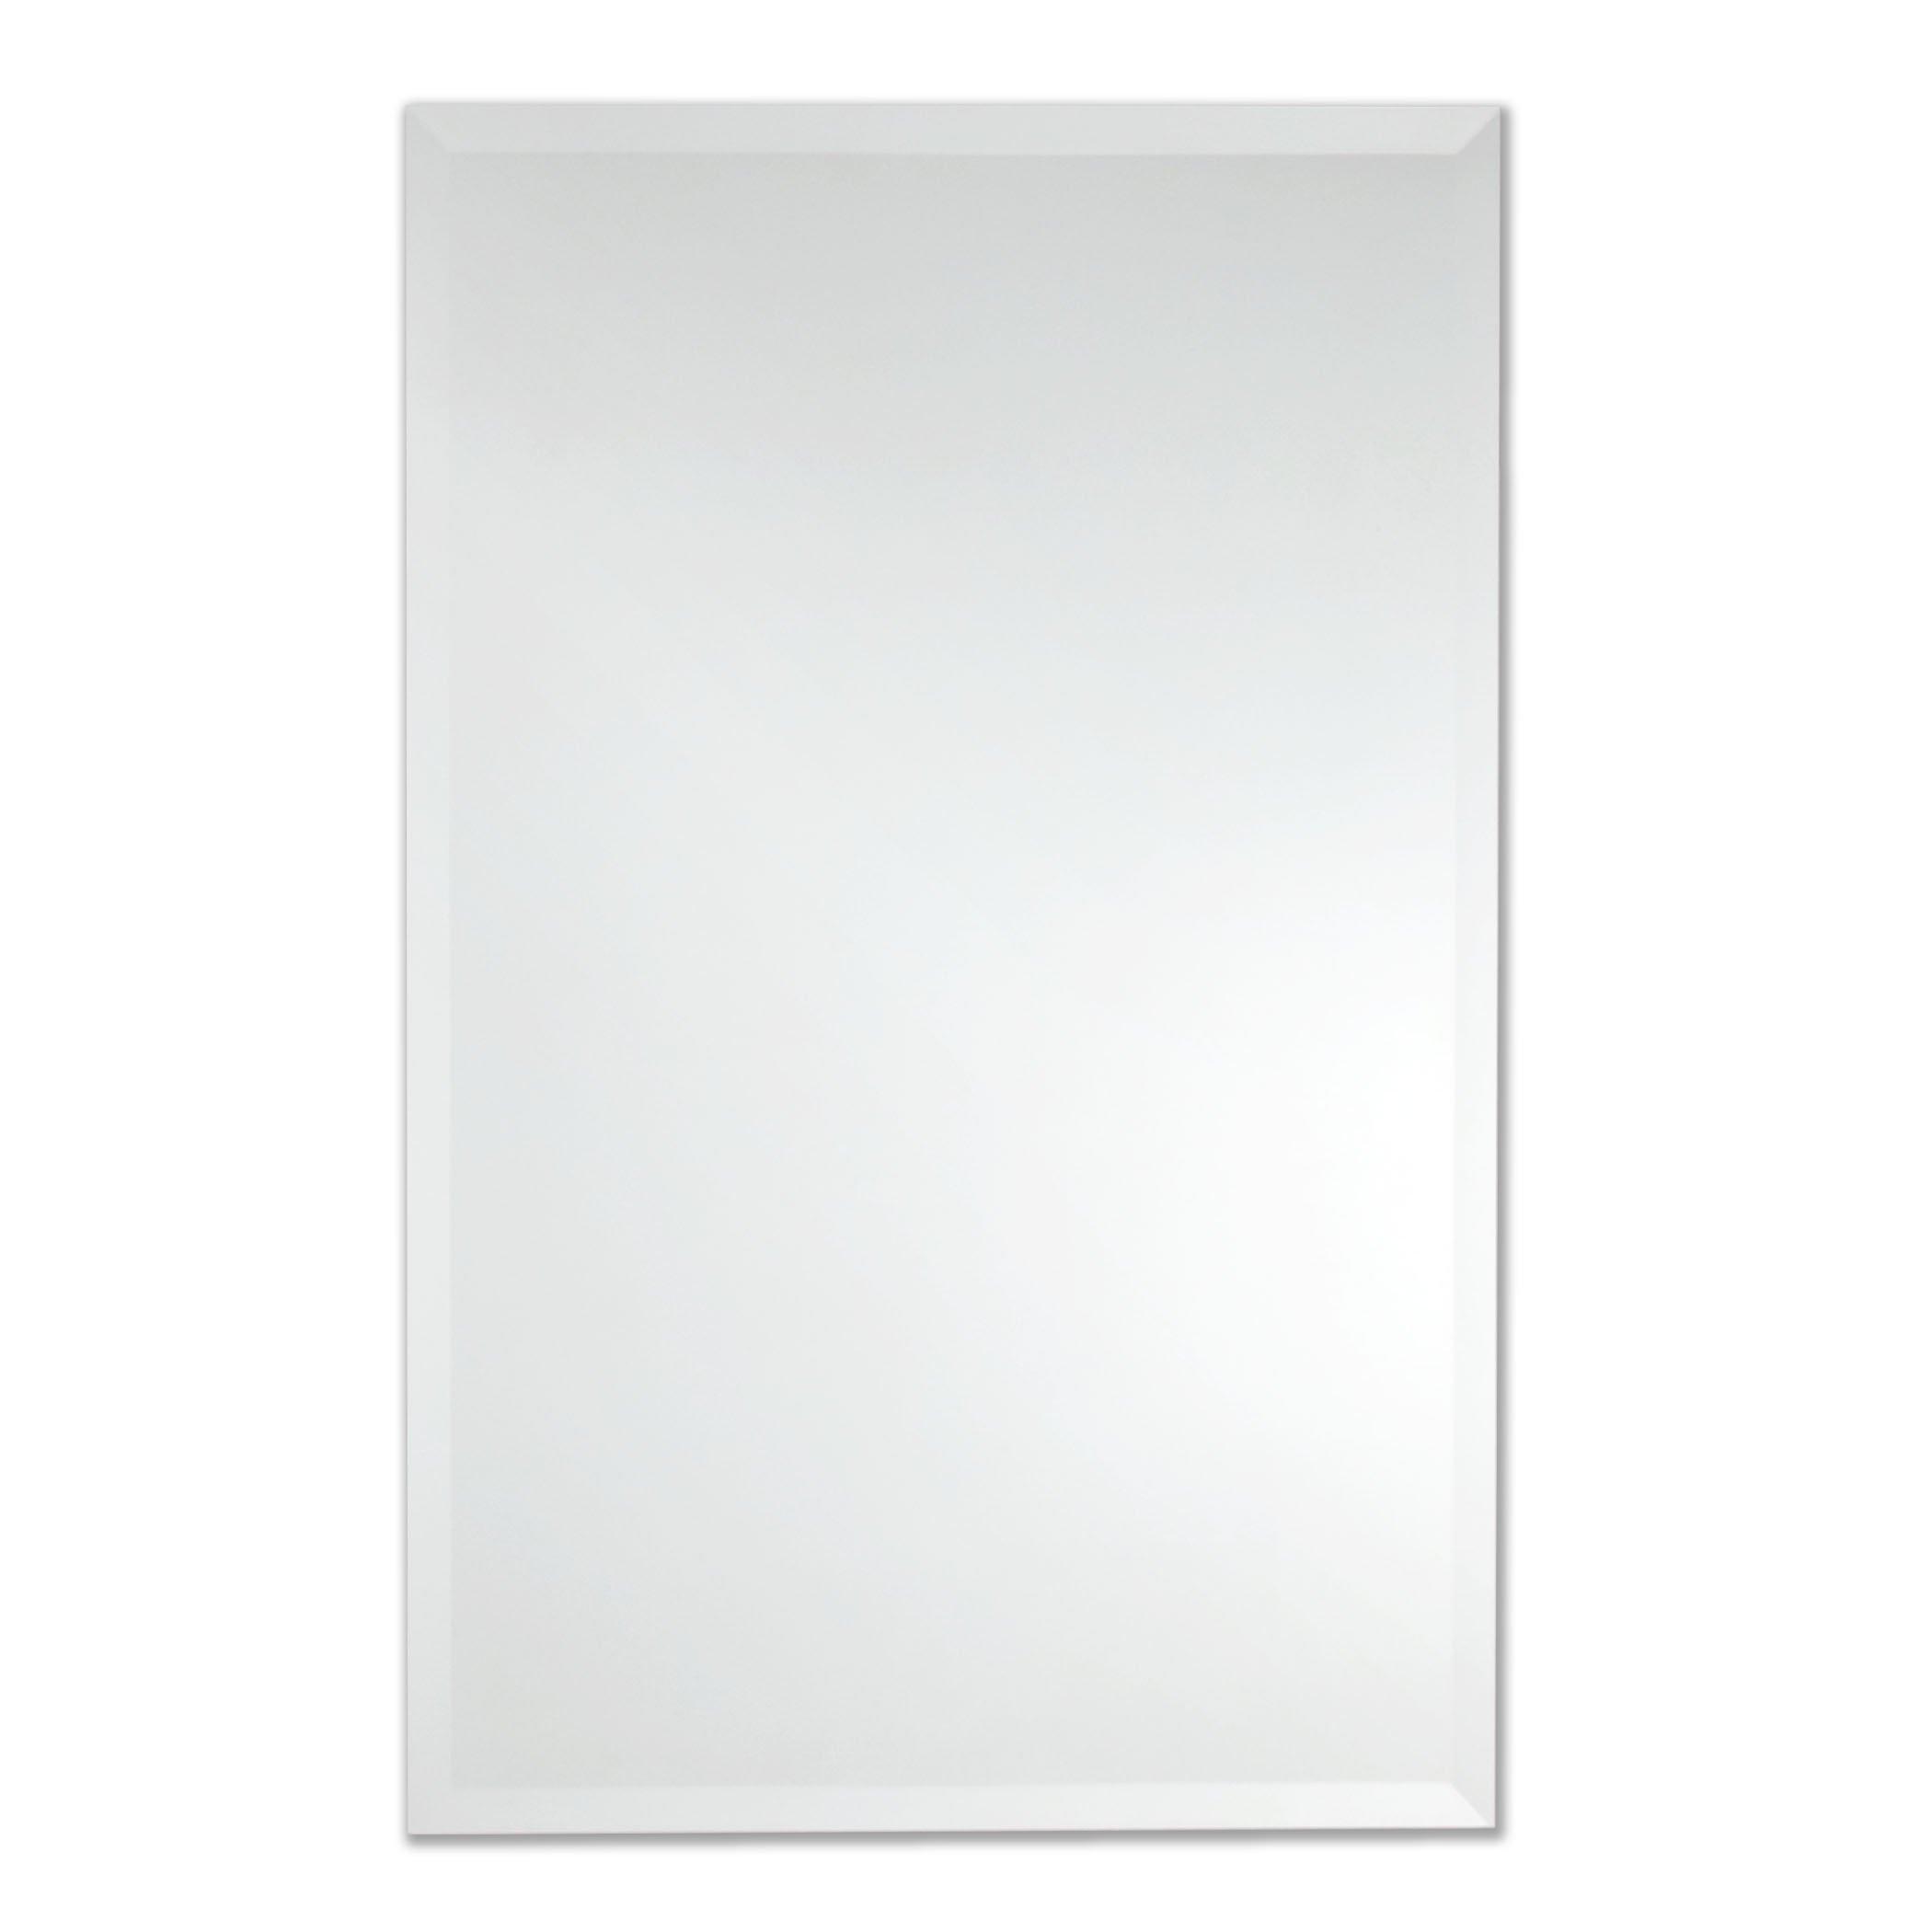 Frameless Rectangle Wall Mirror   Bathroom, Vanity, Bedroom Rectangular Mirror   30-inch x 40-inch (Large)